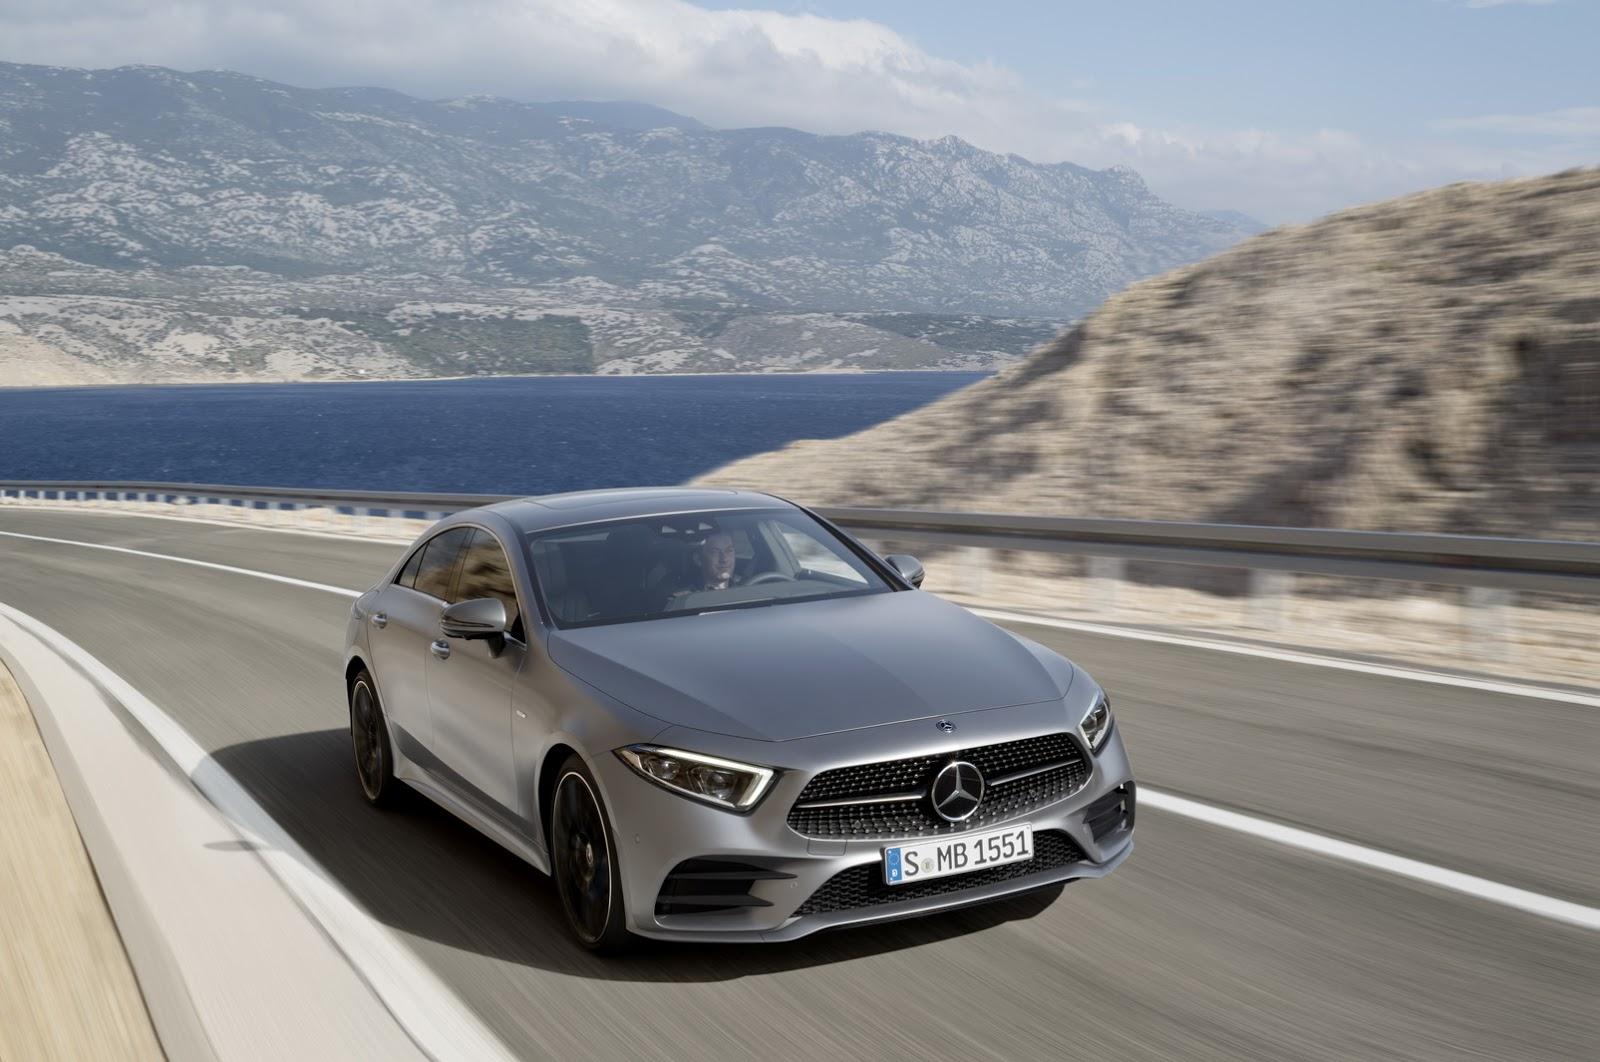 Mercedes CLS MY 2018